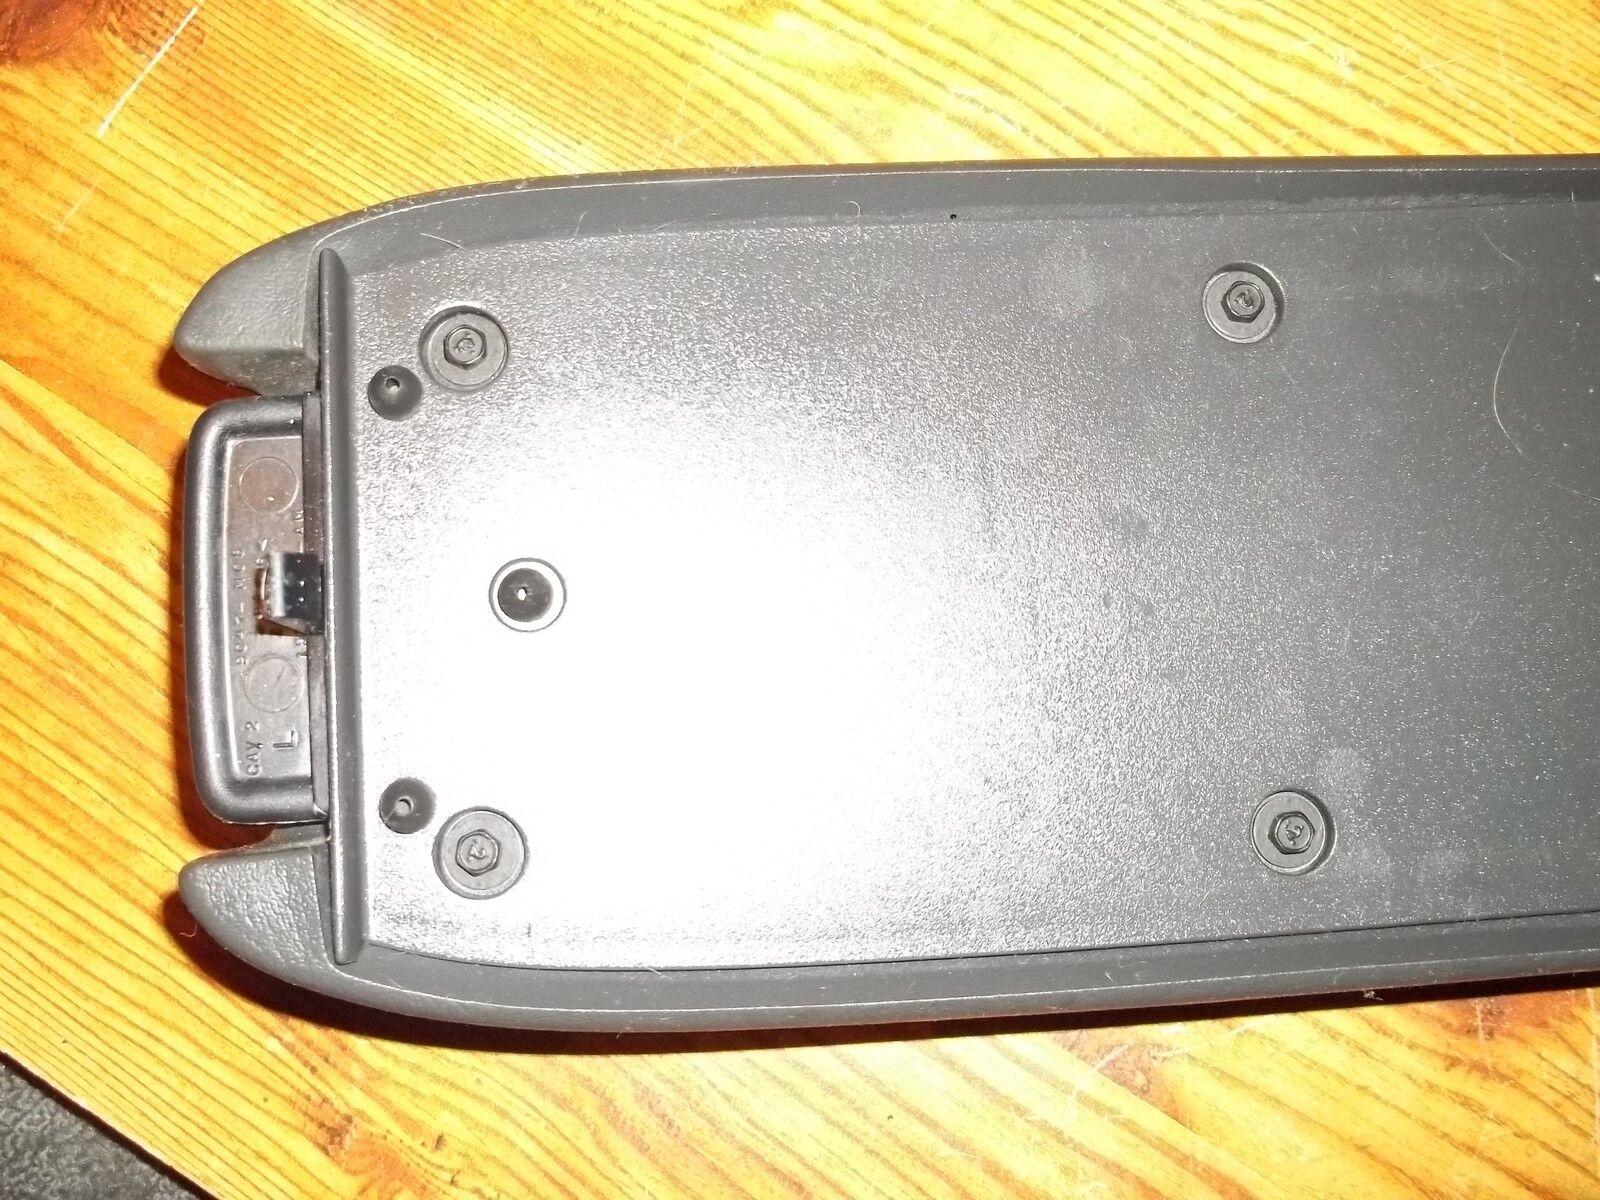 98 05 Chevy S10 Pickup Blazer Gmc Jimmy Sonoma Center Console Lid 4 Of 6 Auto On Column 5